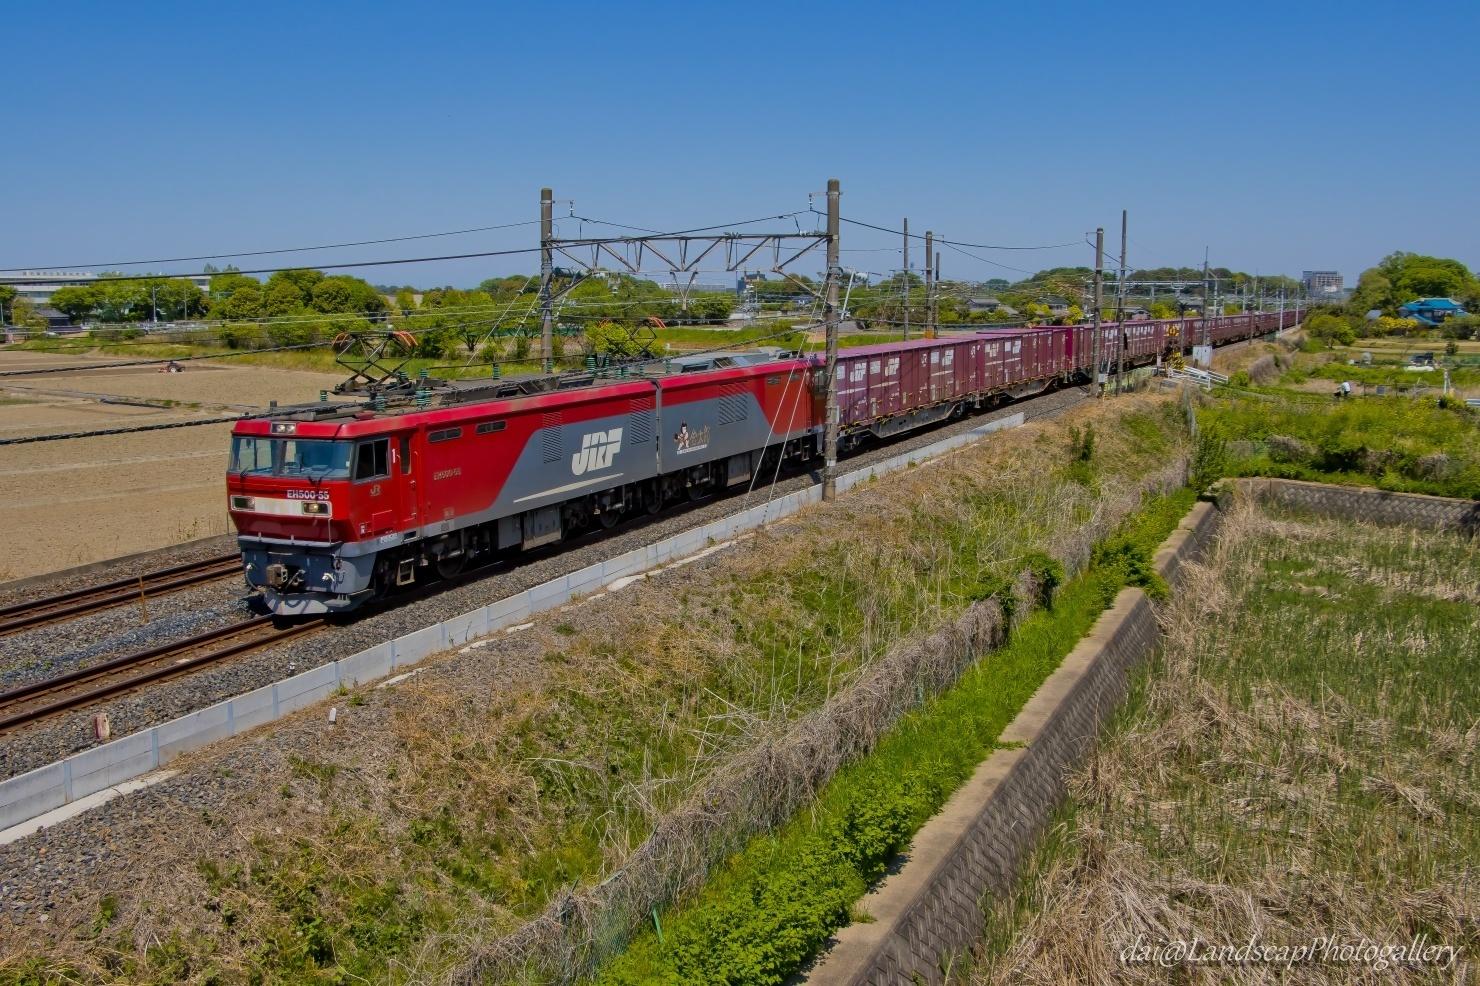 新緑の季節の東北本線貨物列車風景